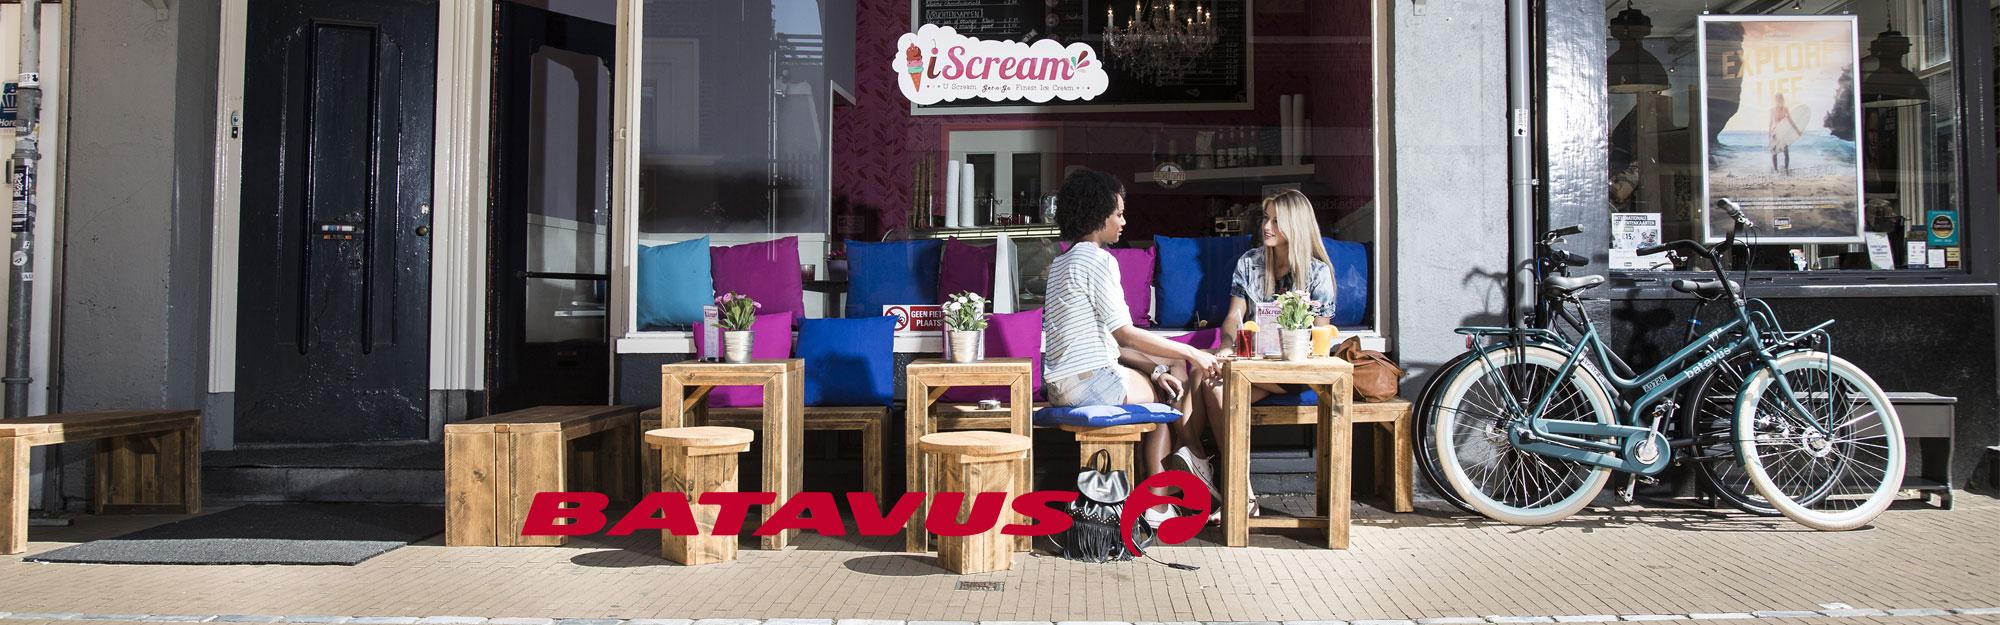 slide-website-2018 batavus 2000x625